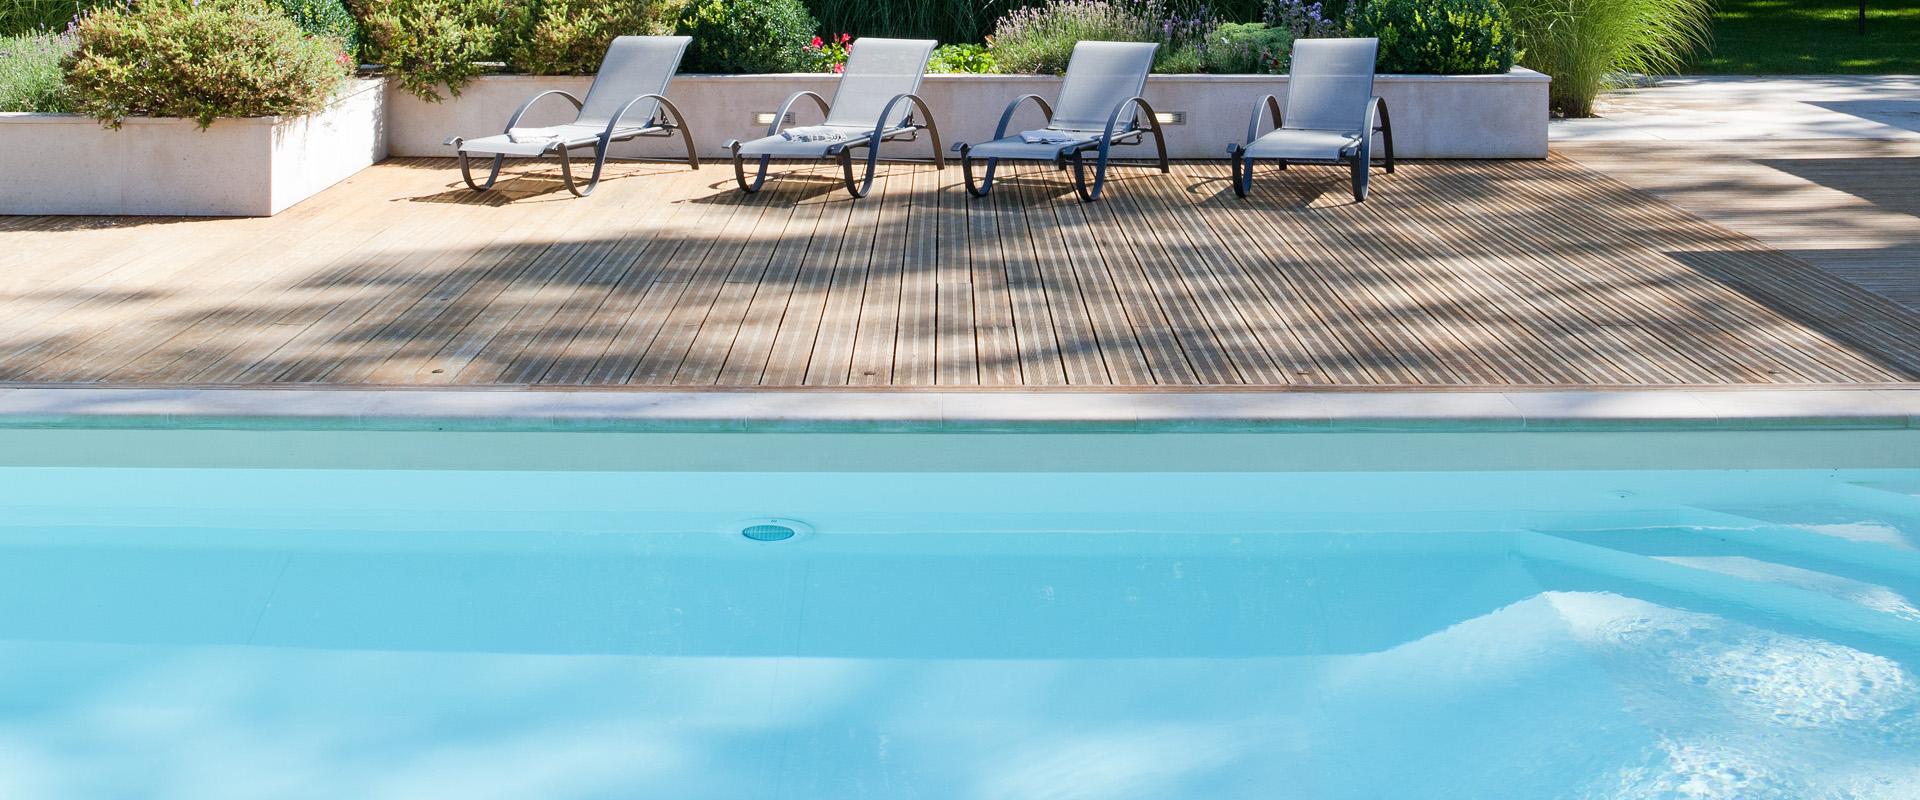 devis piscine hors sol Le Vésinet (Yvelines)